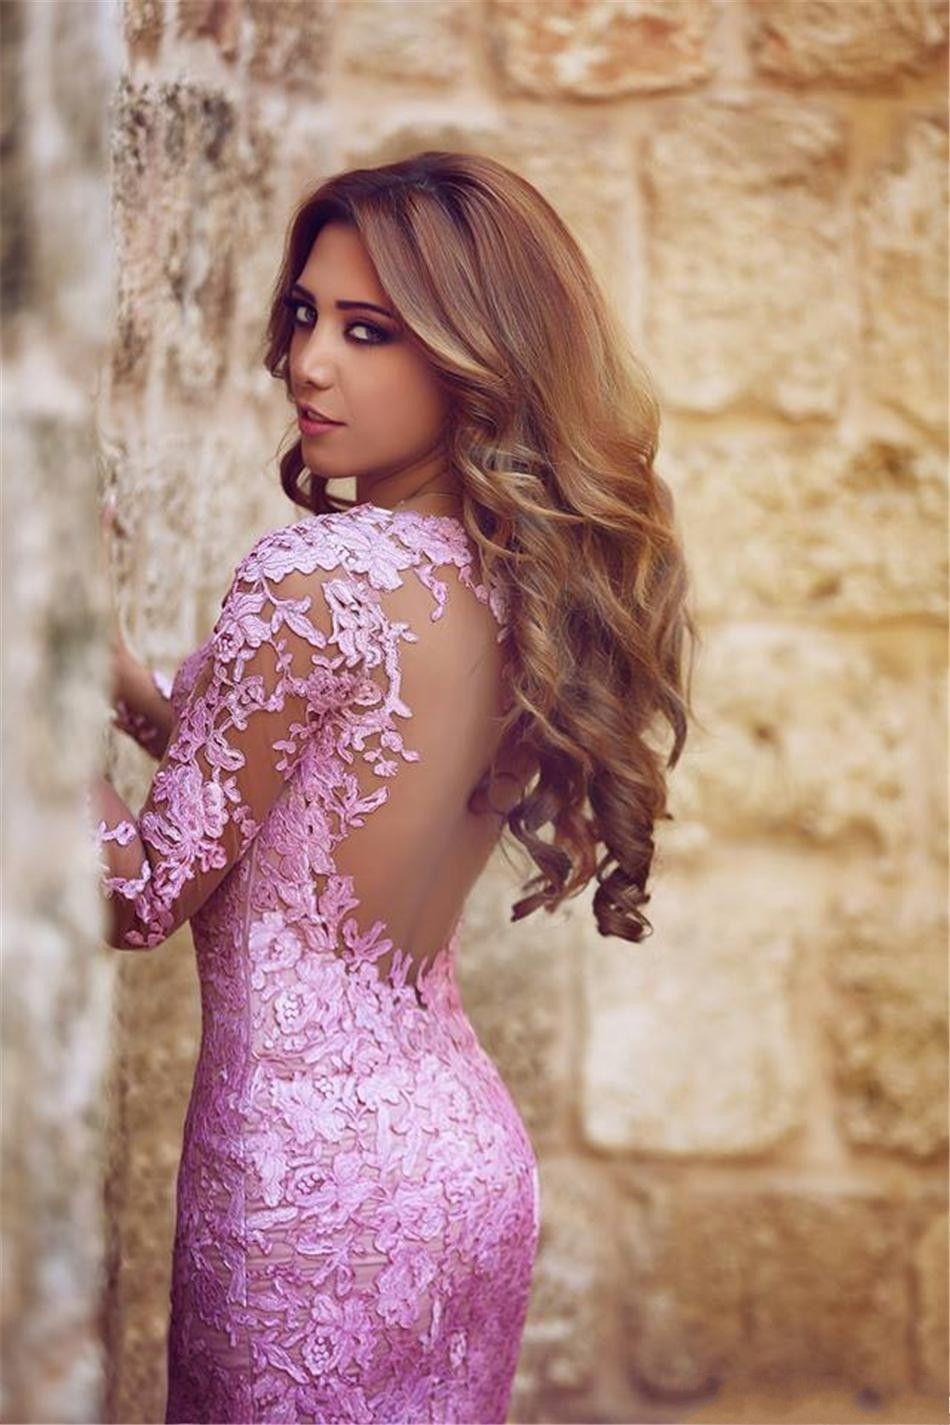 2017 Elegant Lace Mermaid wedding Dresses long Sleeves Sheer Illusion Tulle Skirt Formal Arabic Style Red Carpet Dress for bridal